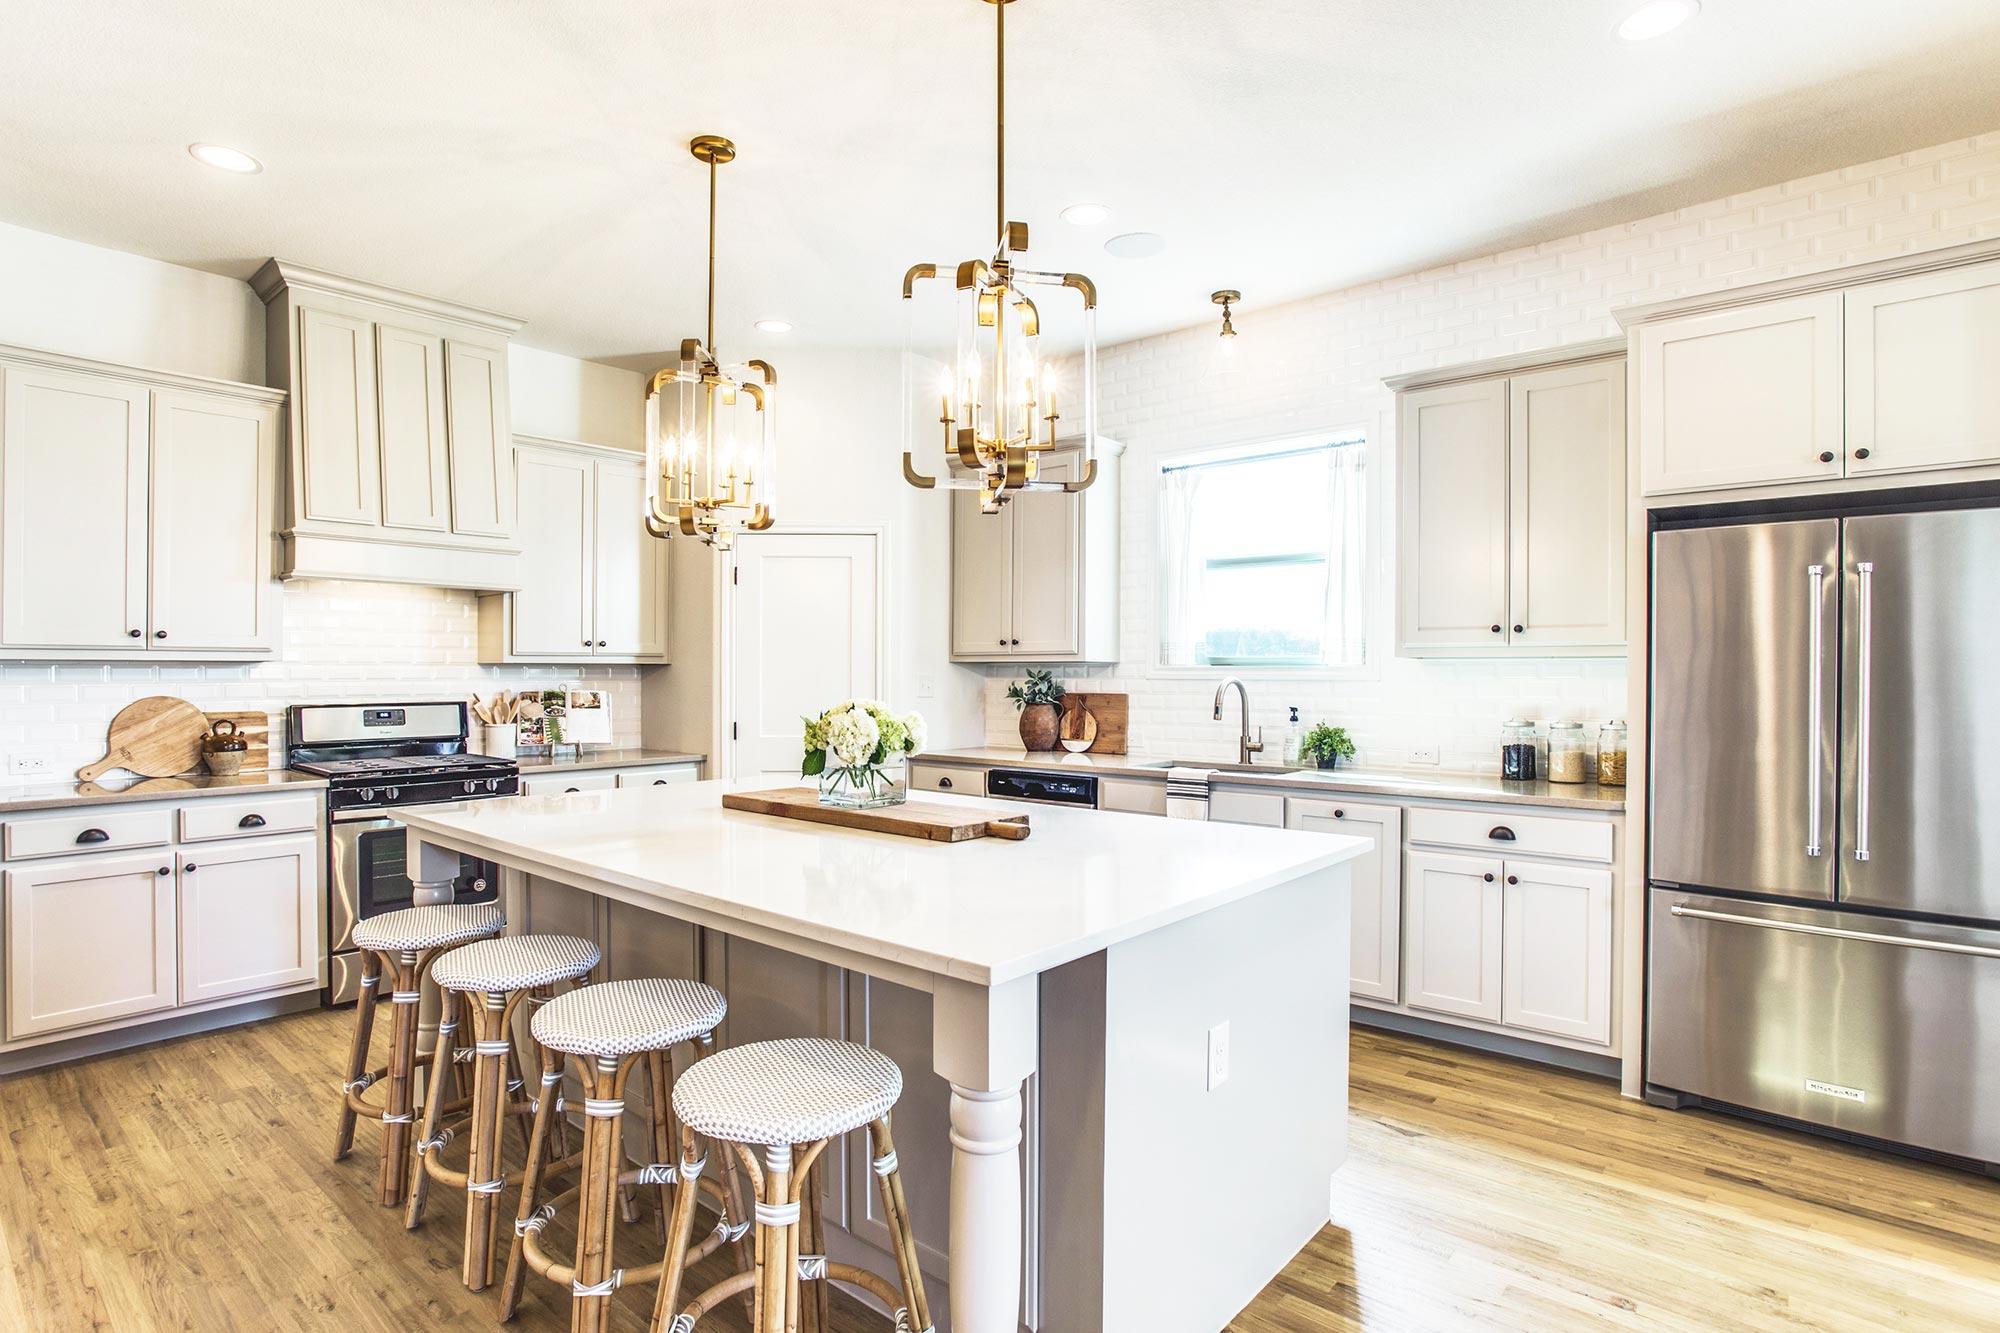 504-point-vista-dr-aledo-tx-High-Res-12-Kitchen - Clarity Homes ...